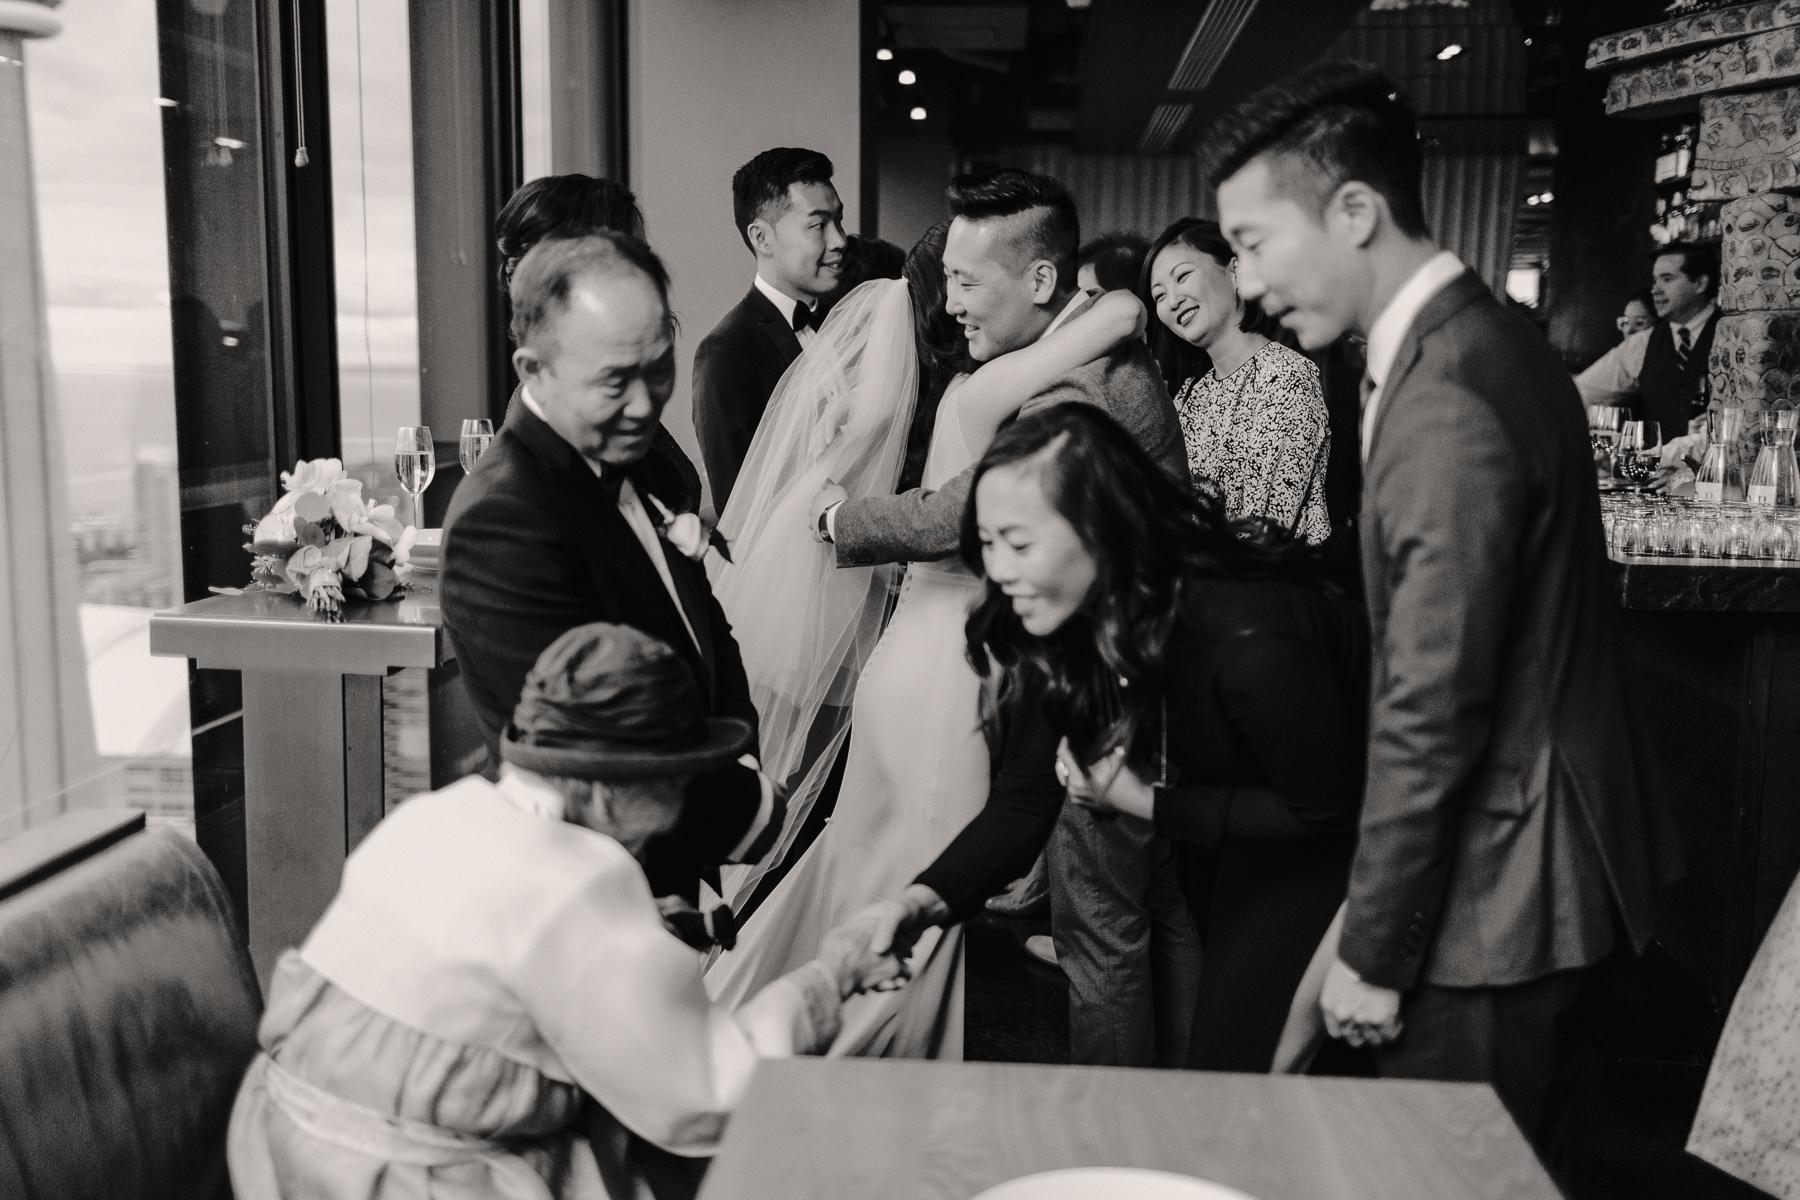 cannoe-restaurannt-wedding 0063.jpg